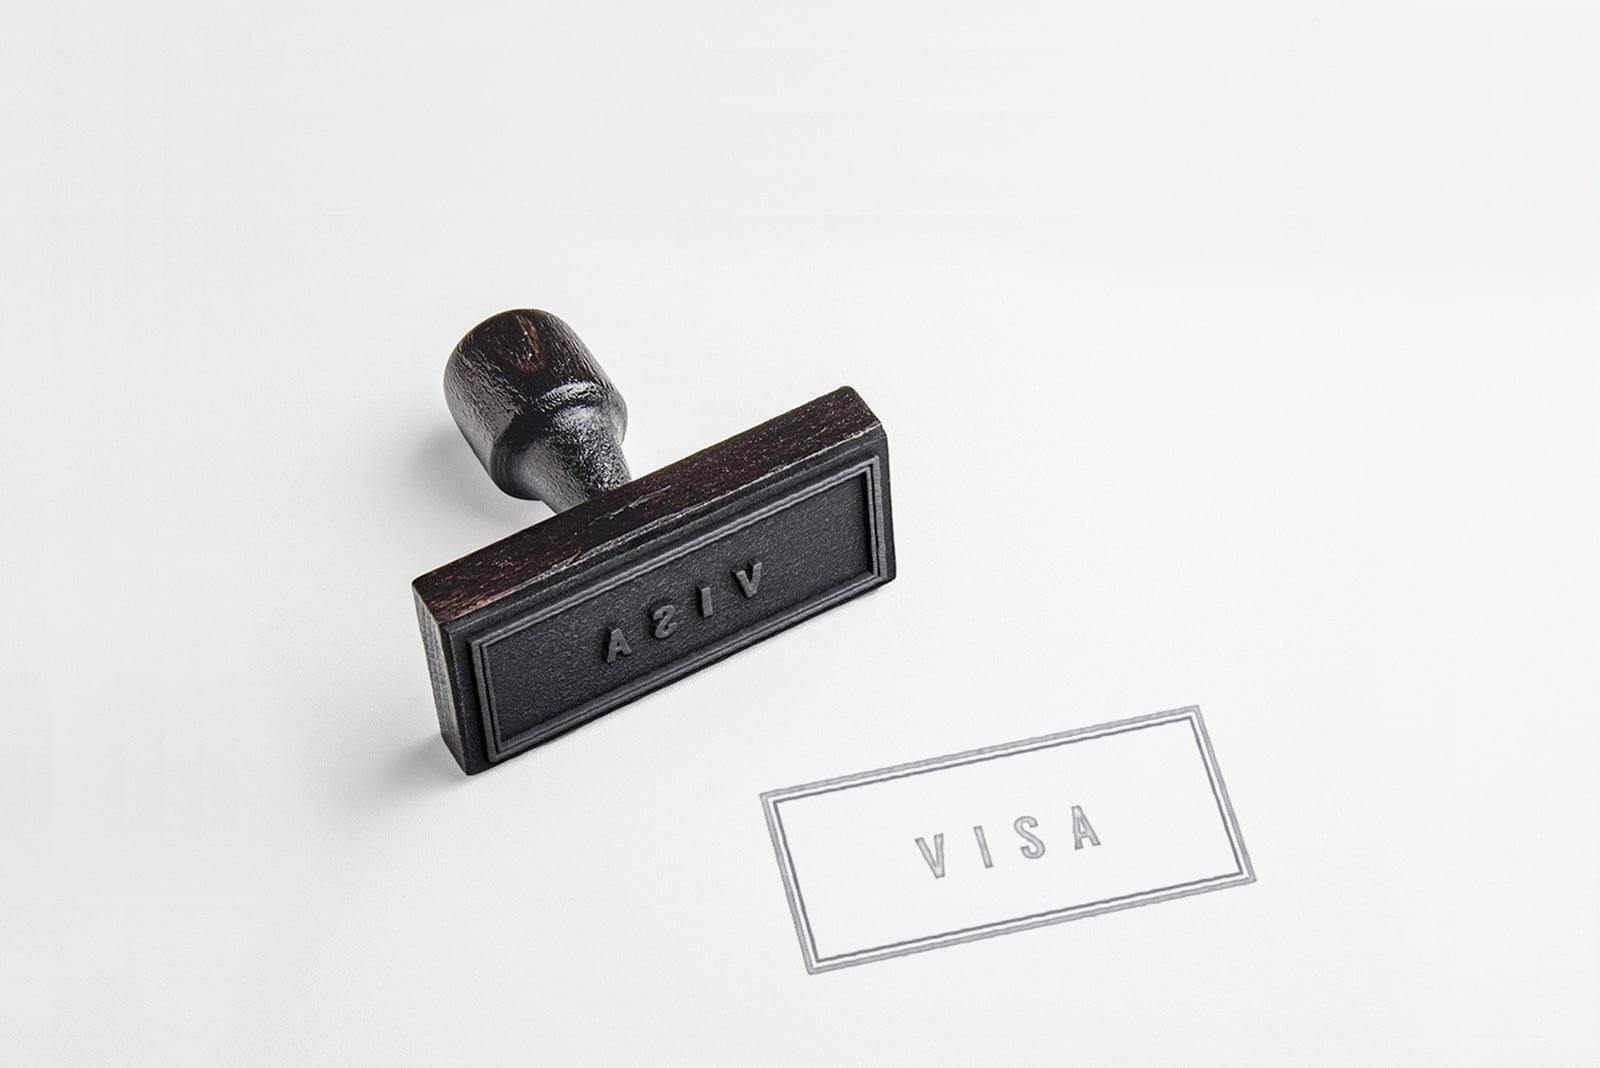 Getting A Uganda Visa On Arrival On Arrival